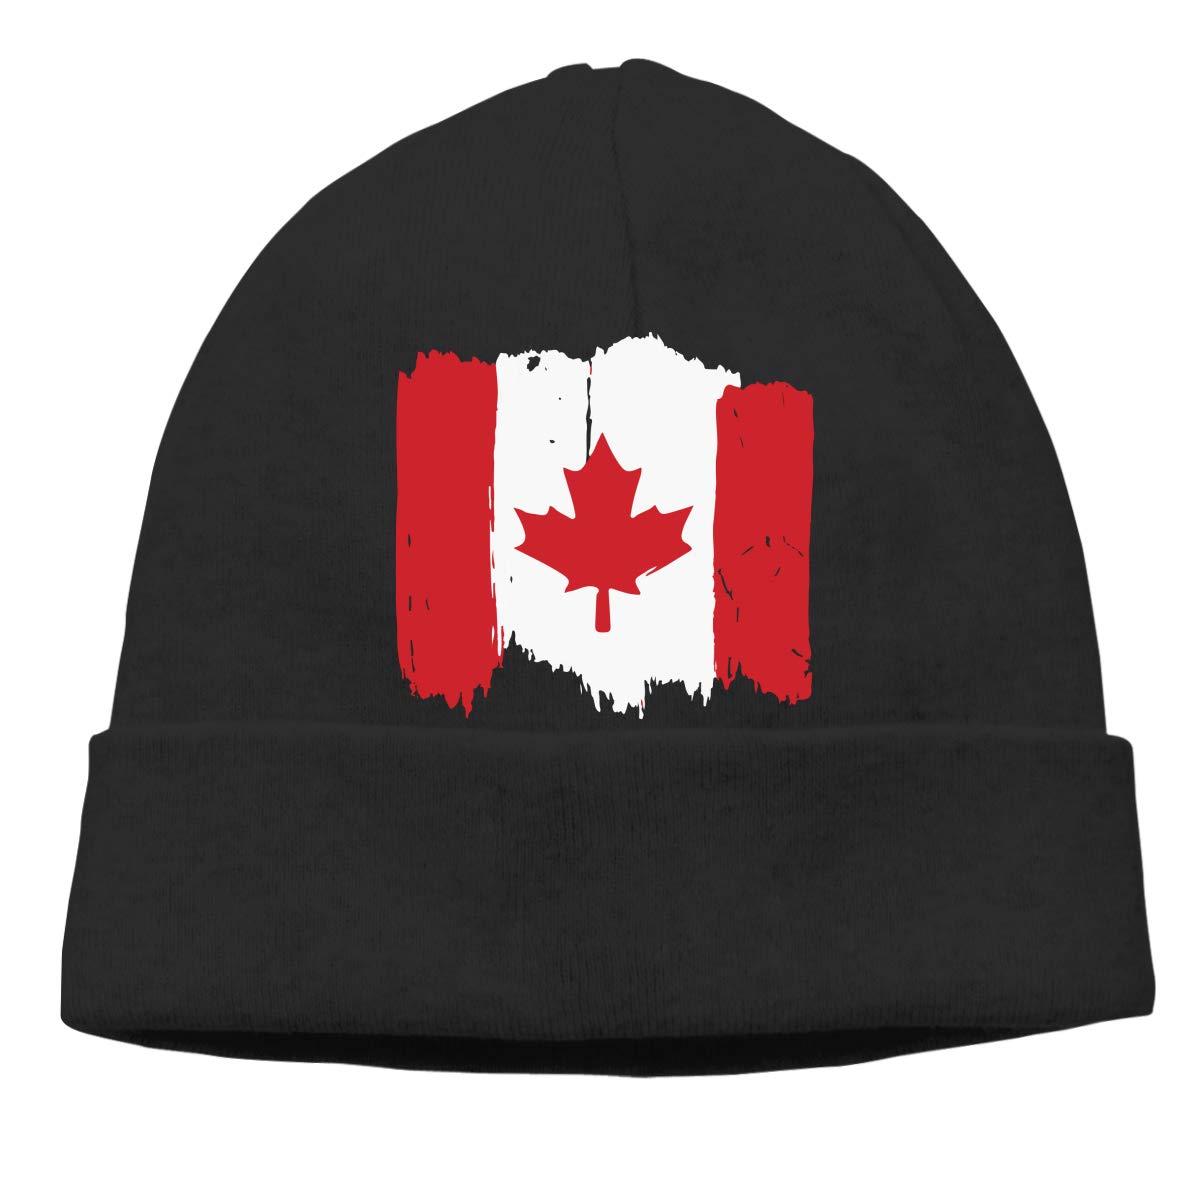 GDSG5/&4 Canadian Flag Men//Women Knitting Wool Warm Winter Ski Beanie Cap